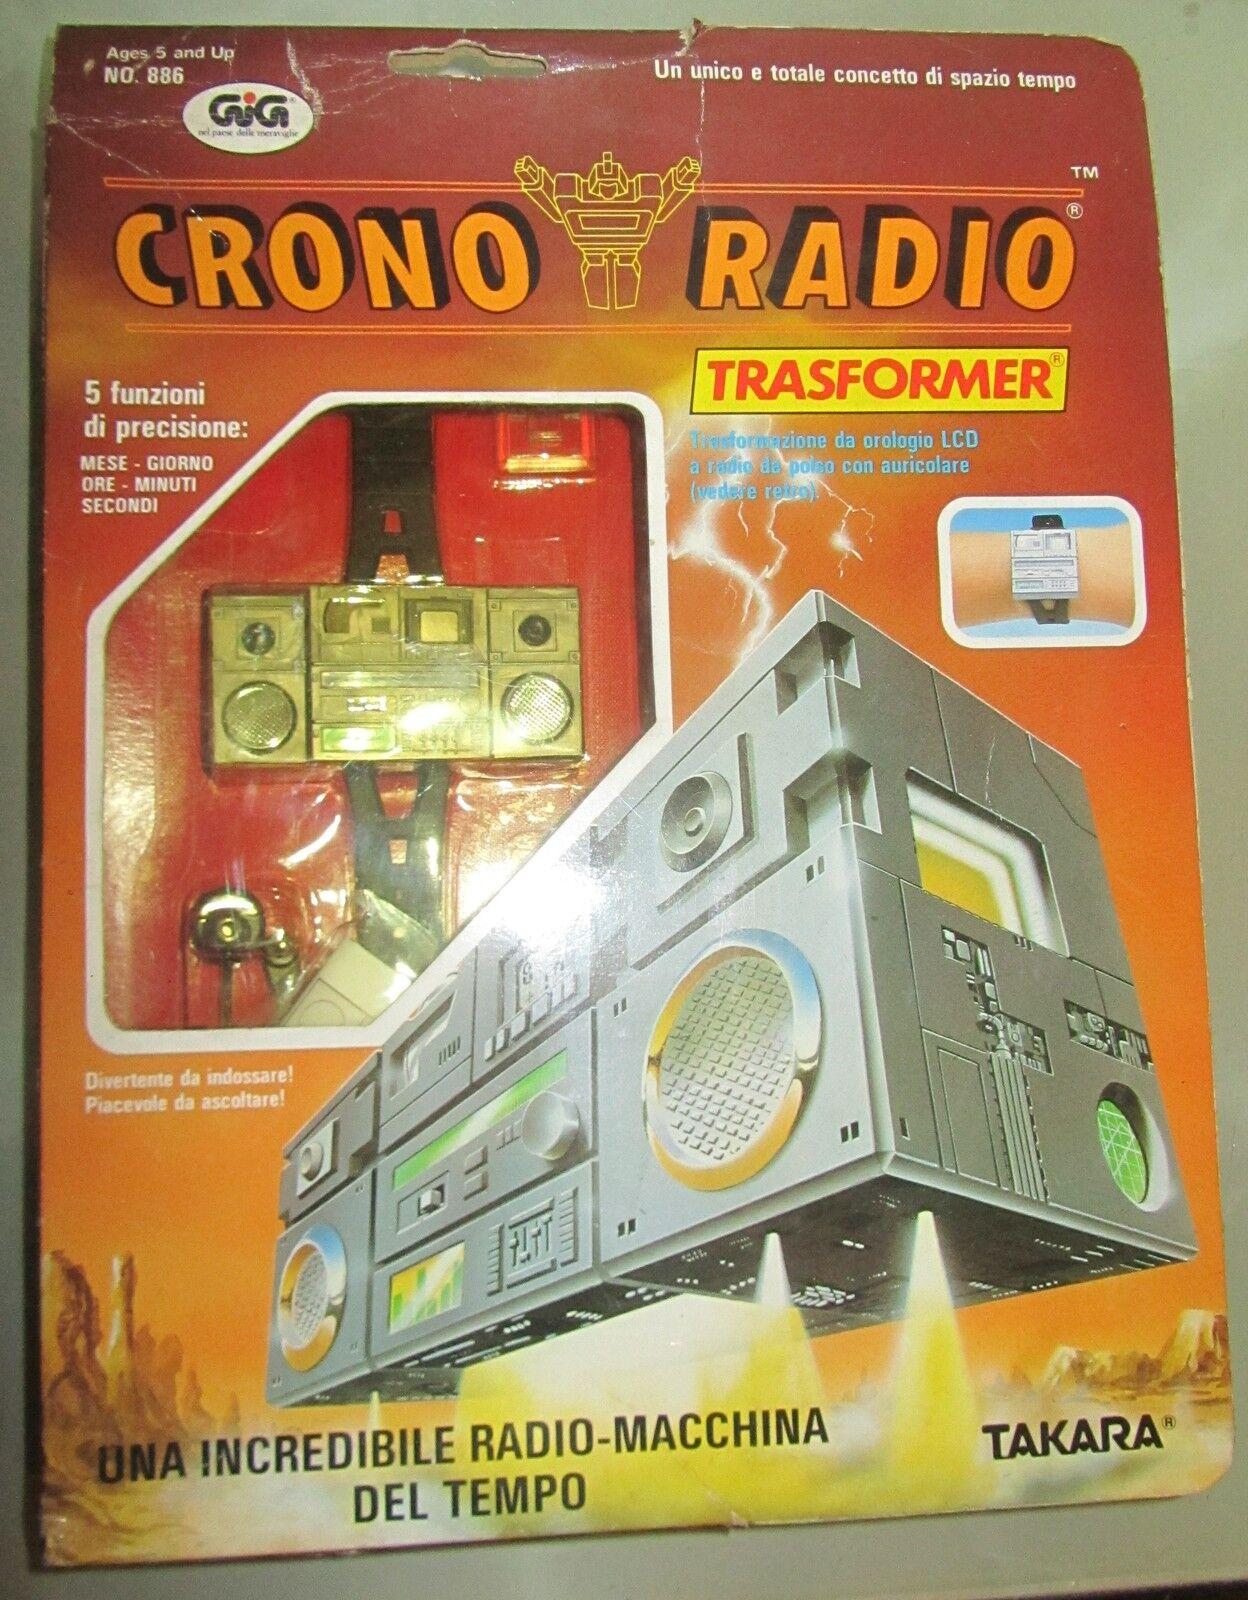 Crono Radio Trasformer Transformers Takara GIG Diaclone SPESE GRATIS